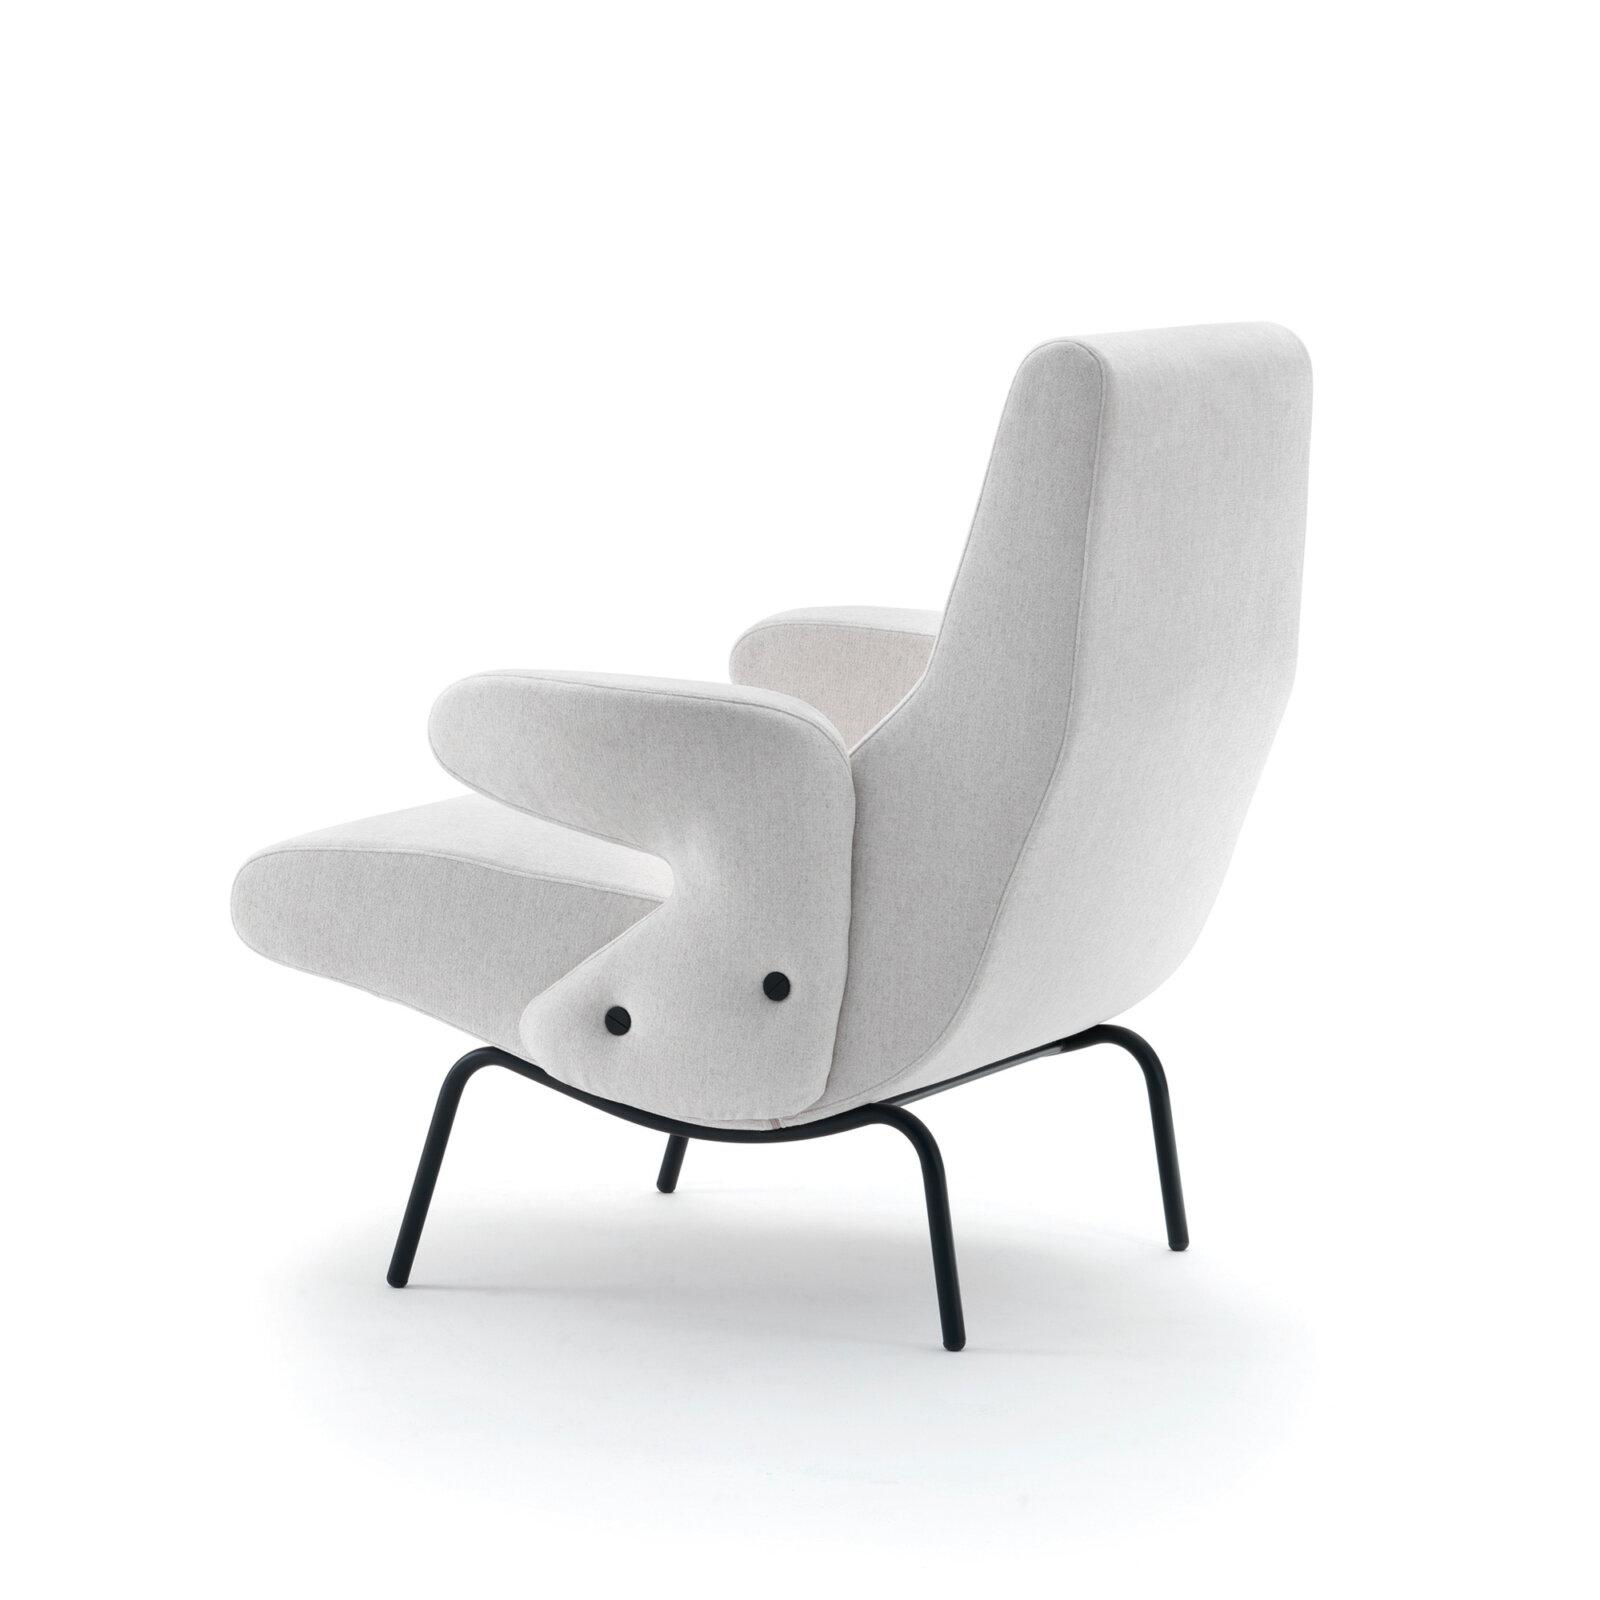 TinnappleMetz-arflex-delfino-armchair_06